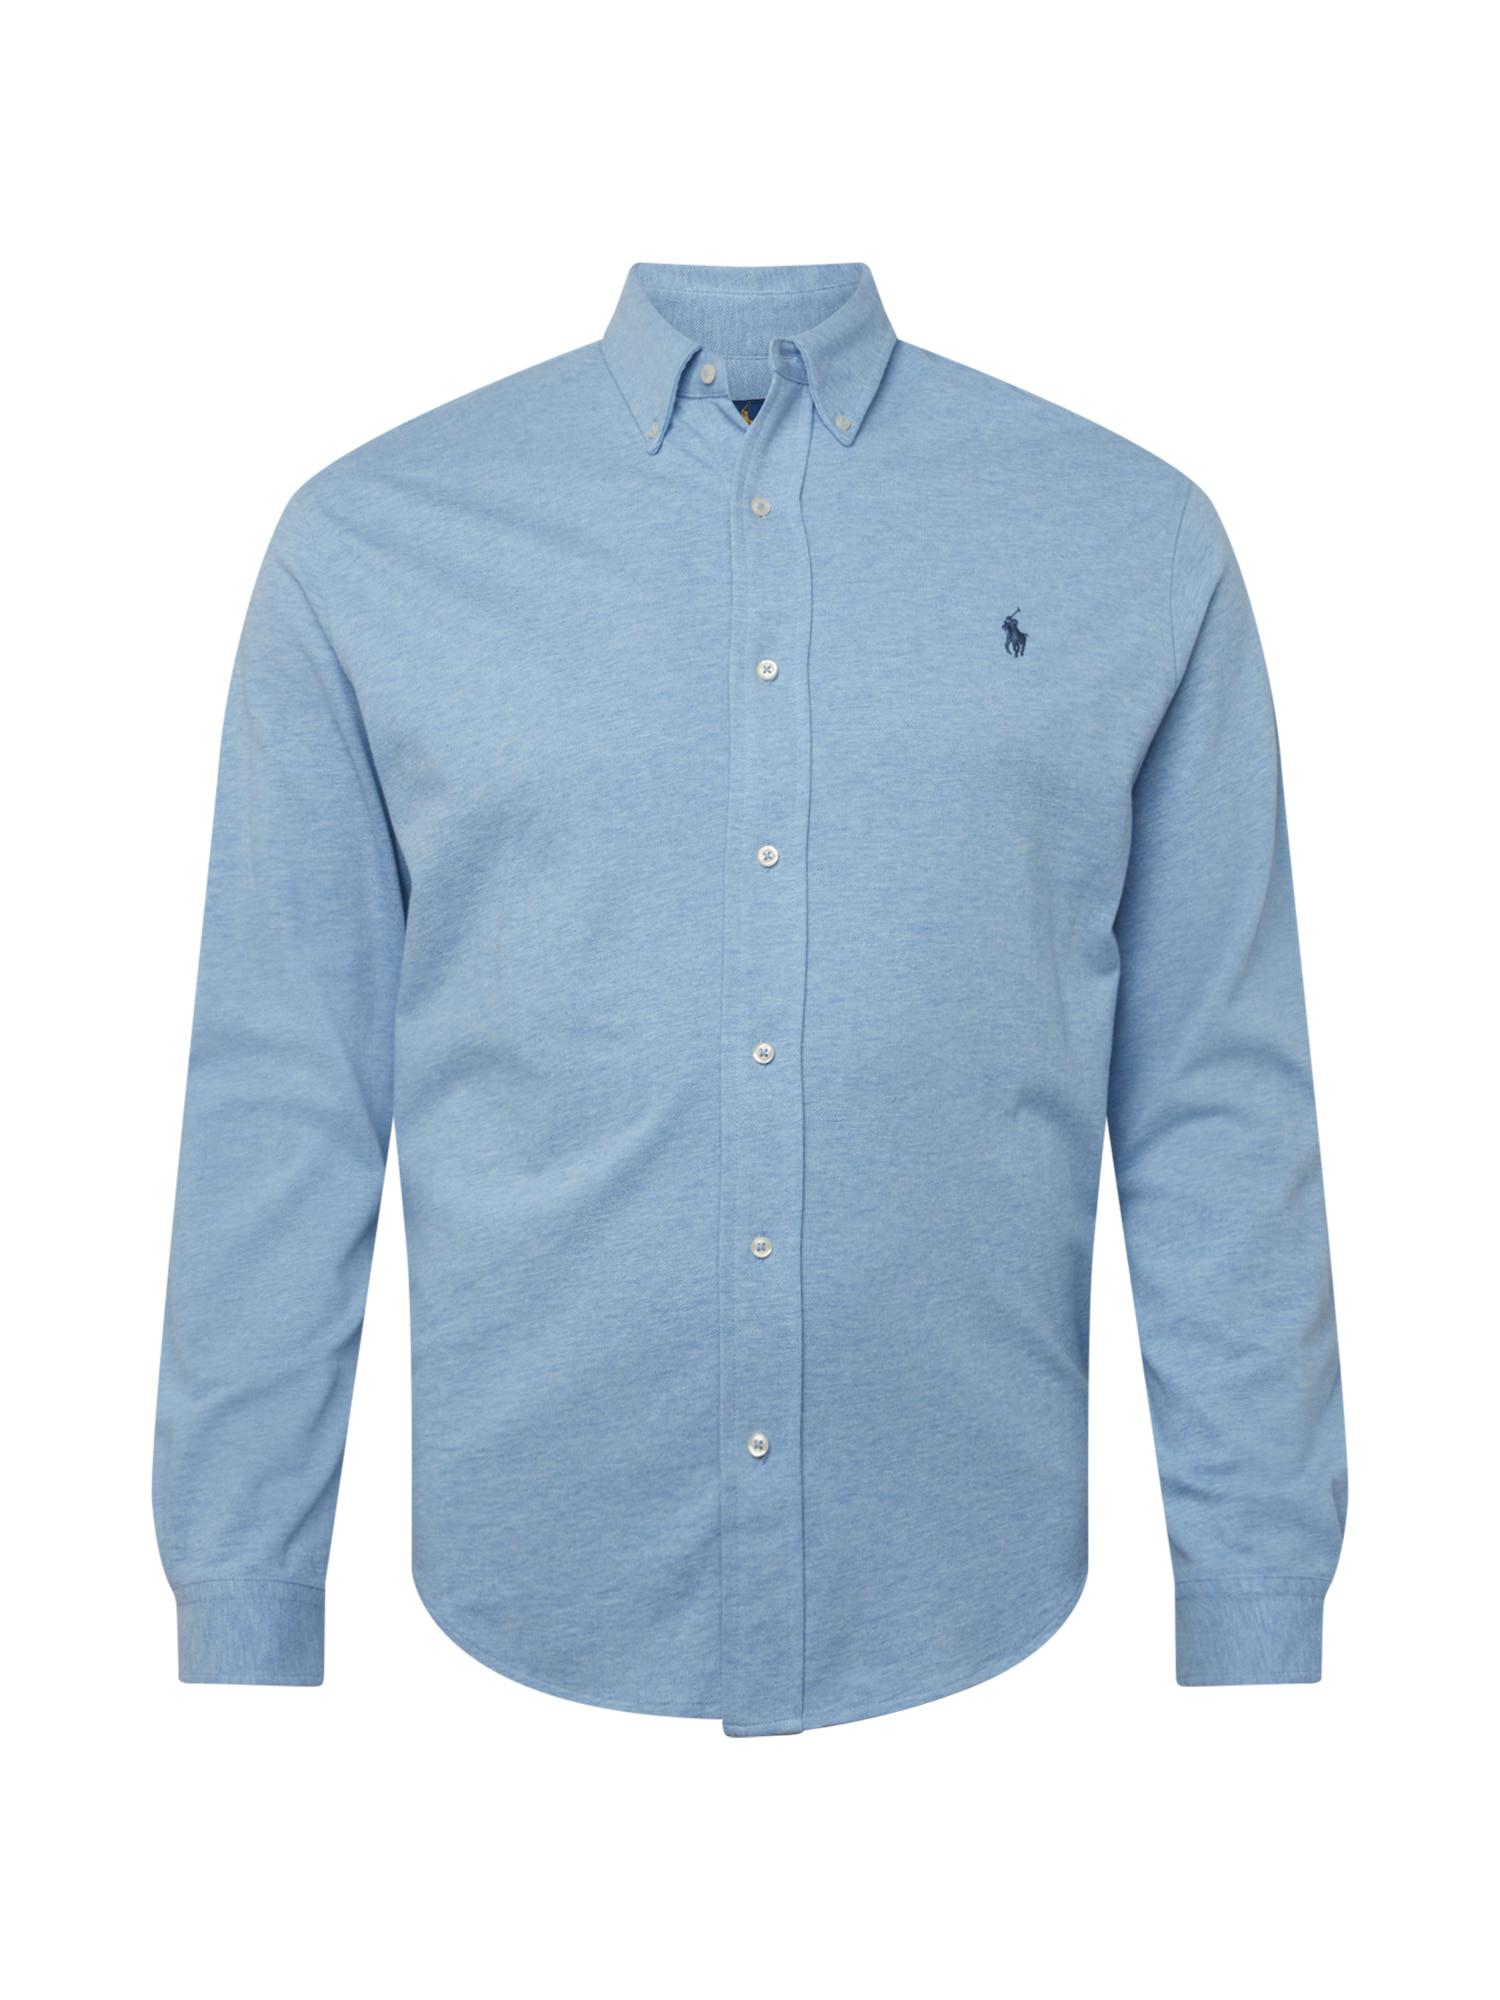 Polo Ralph Lauren Big & Tall Marškiniai mėlyna dūmų spalva